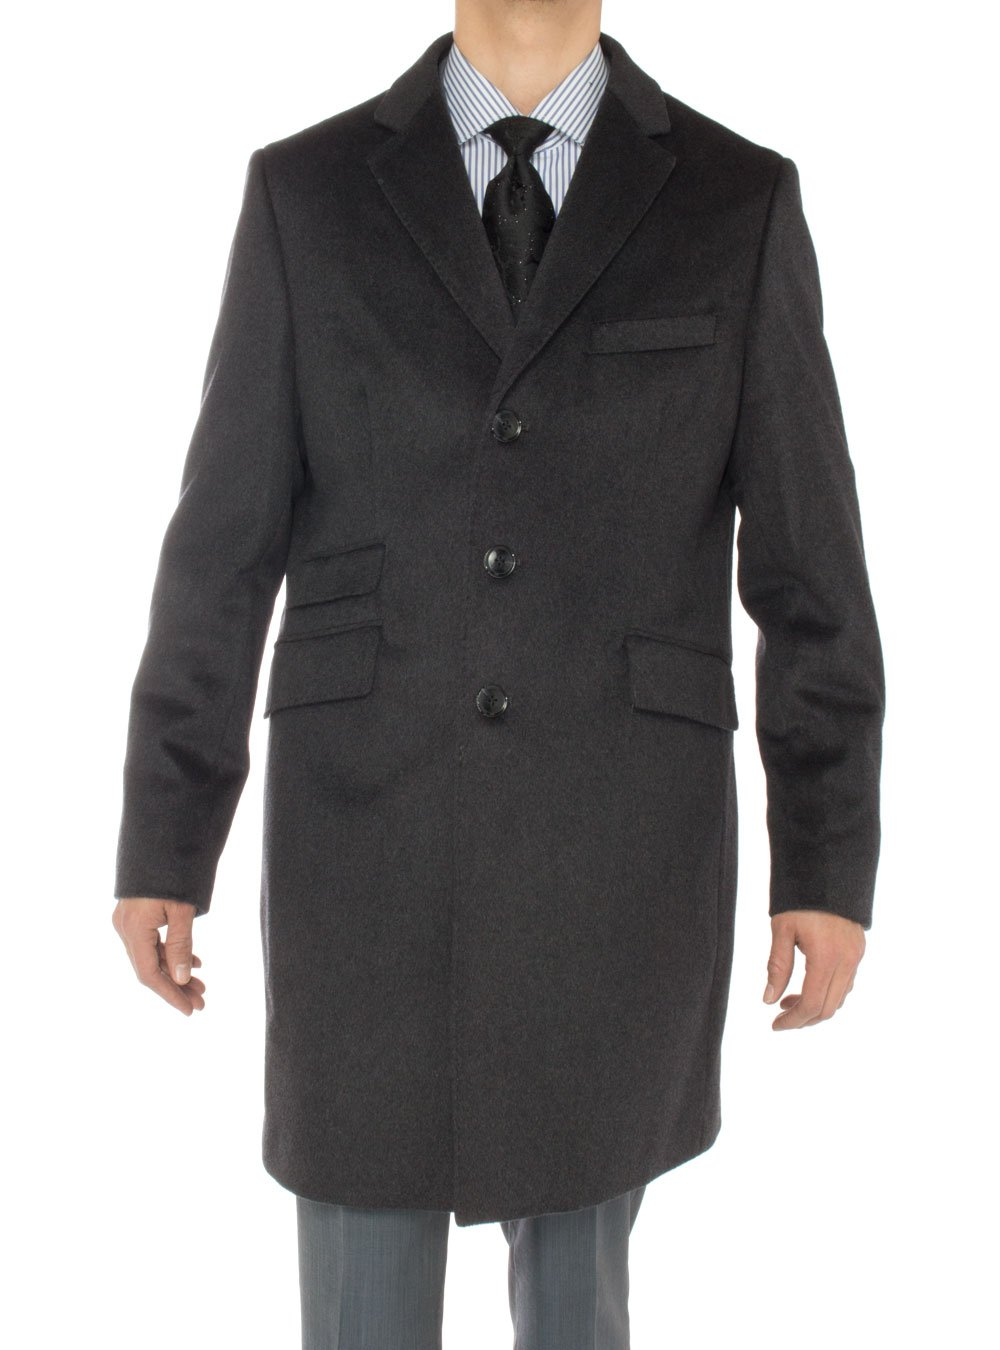 Luciano Natazzi Men's Cashmere Topcoat Modern Ticket Pocket Trench Coat Overcoat (42 US - 52 EU, Charcoal Gray)